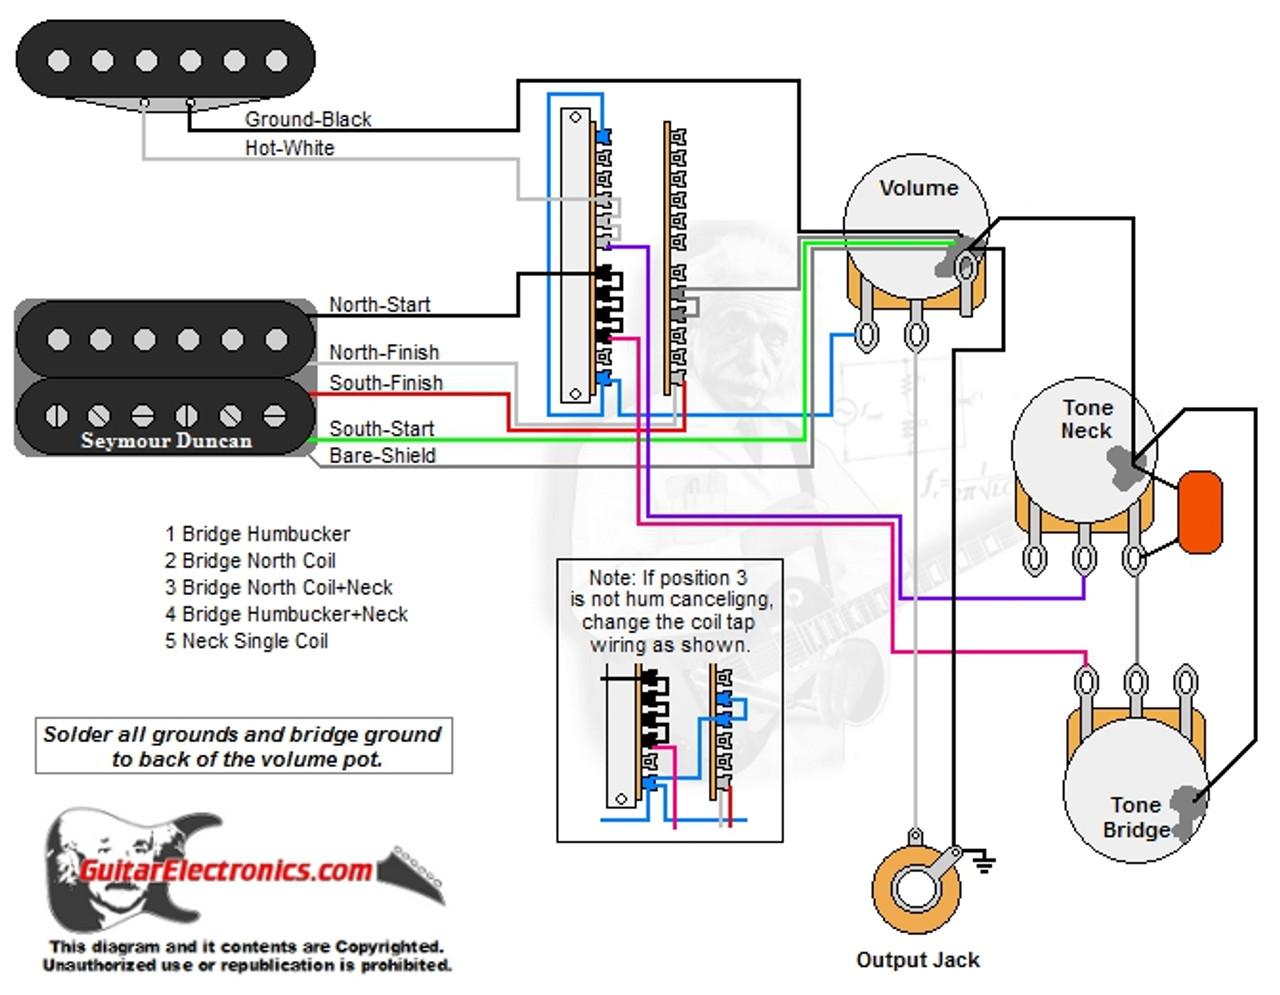 small resolution of 1 humbucker 1 single coil 5 way lever switch 1 volume 2 tones 011 humbucker 1